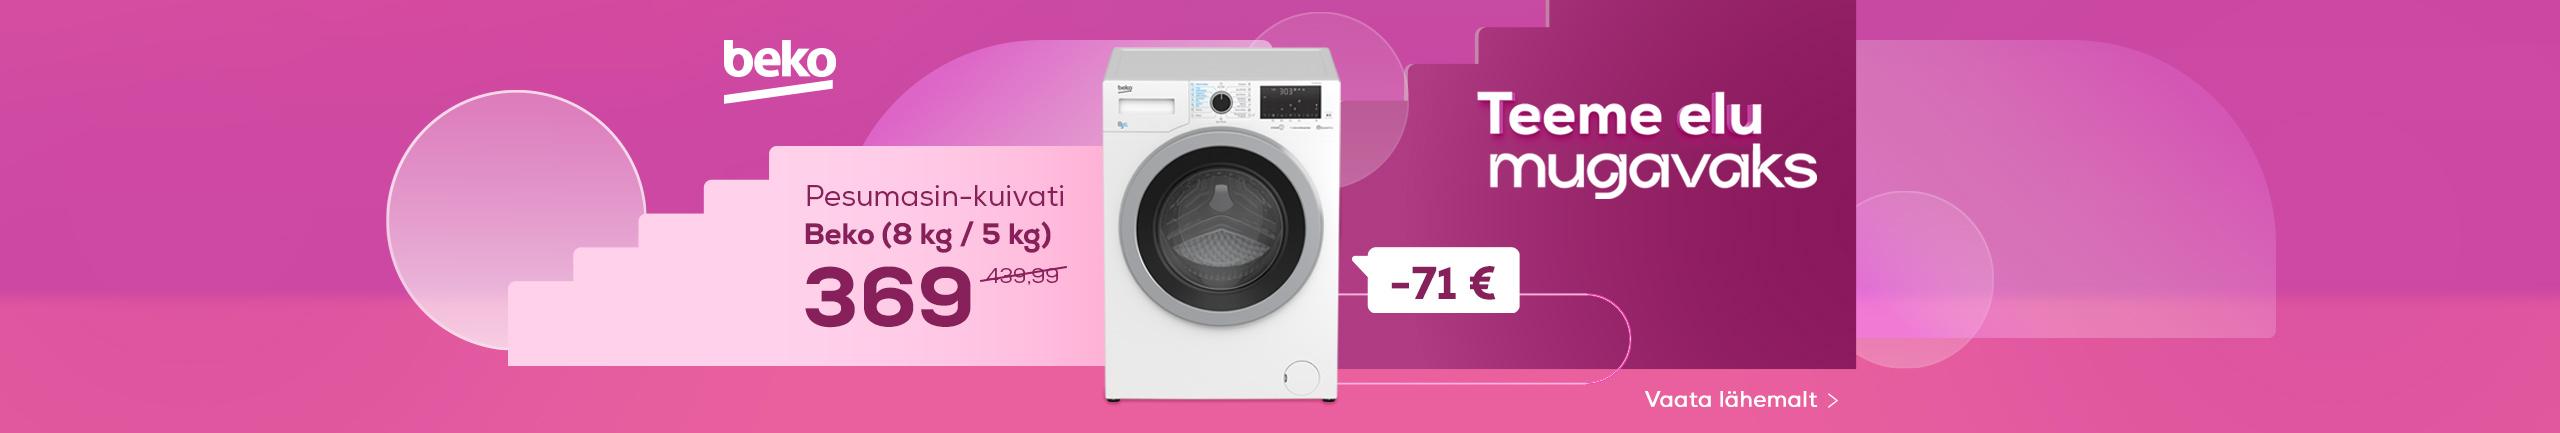 NPL We make life easy! Washing machine-dryer Beko